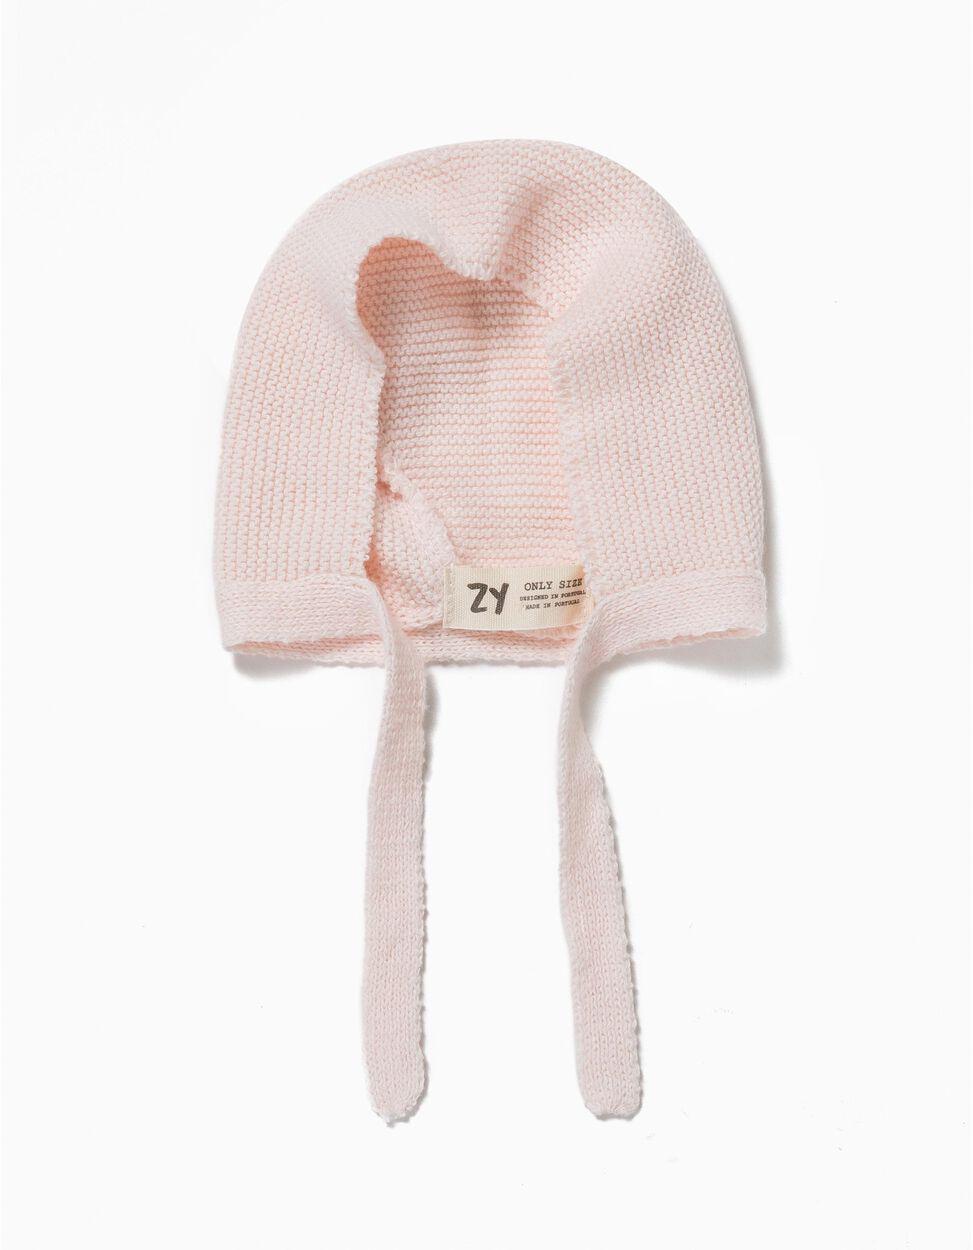 Touca de malha rosa